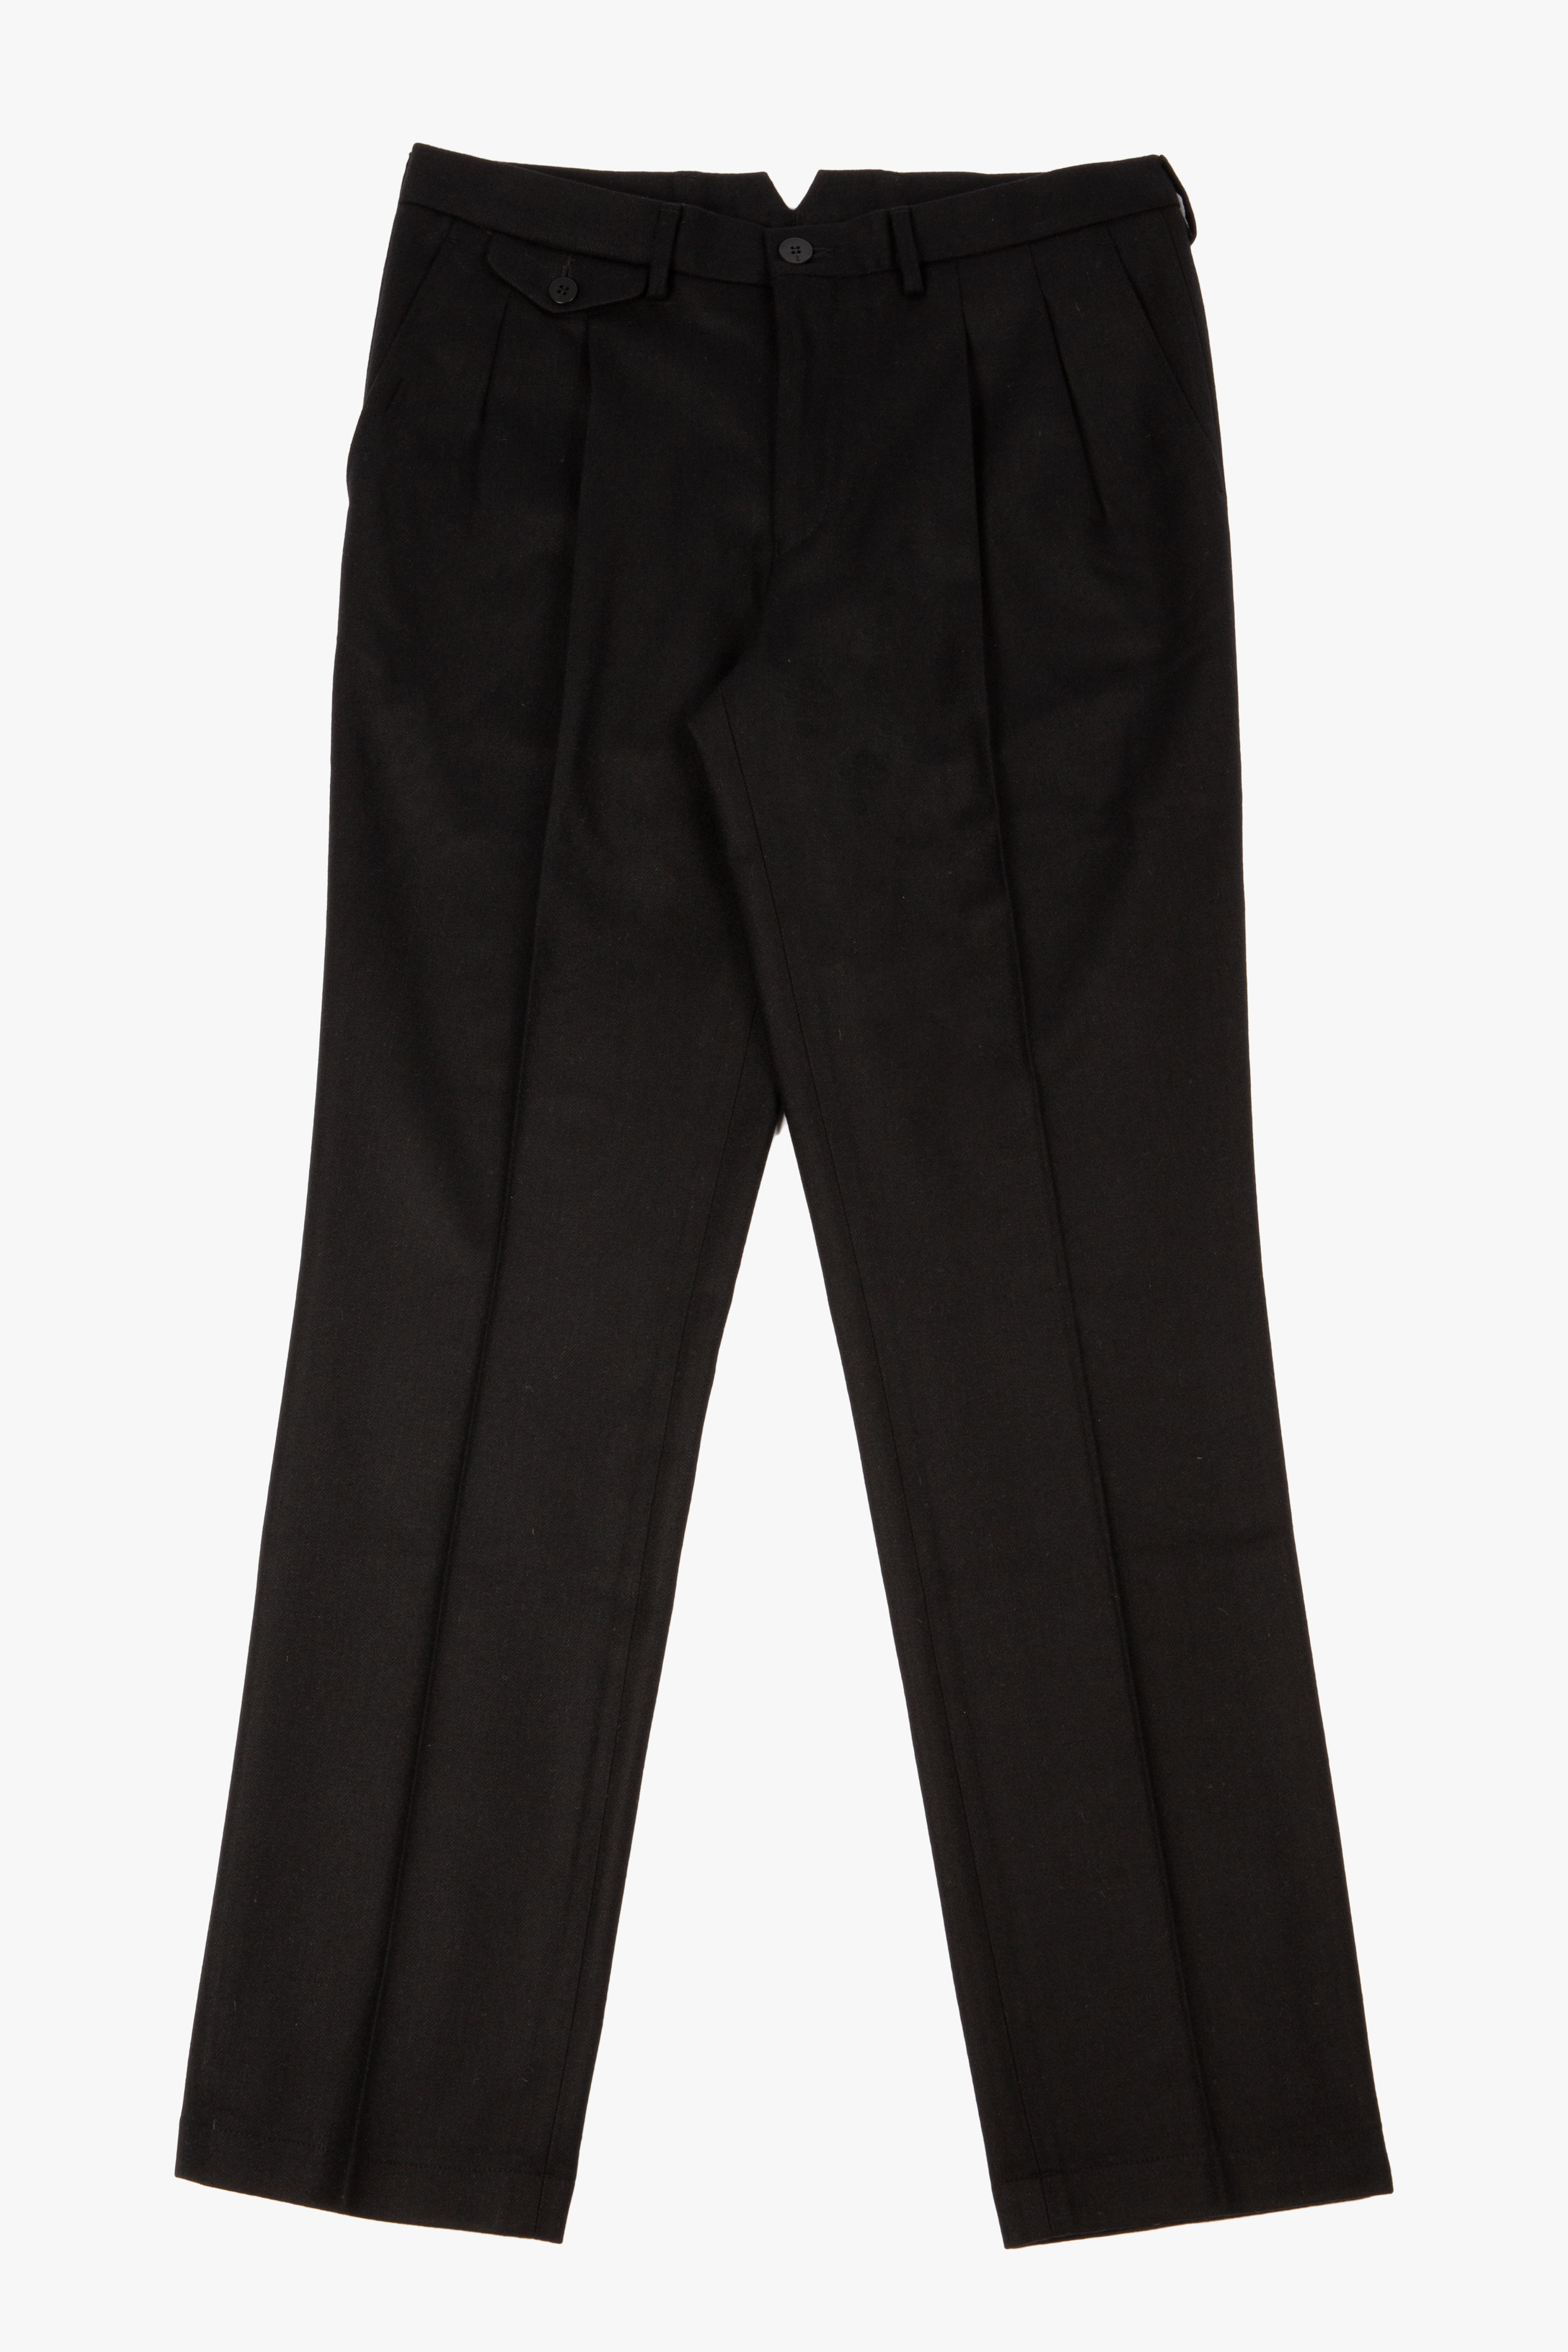 Palmas Trousers Black